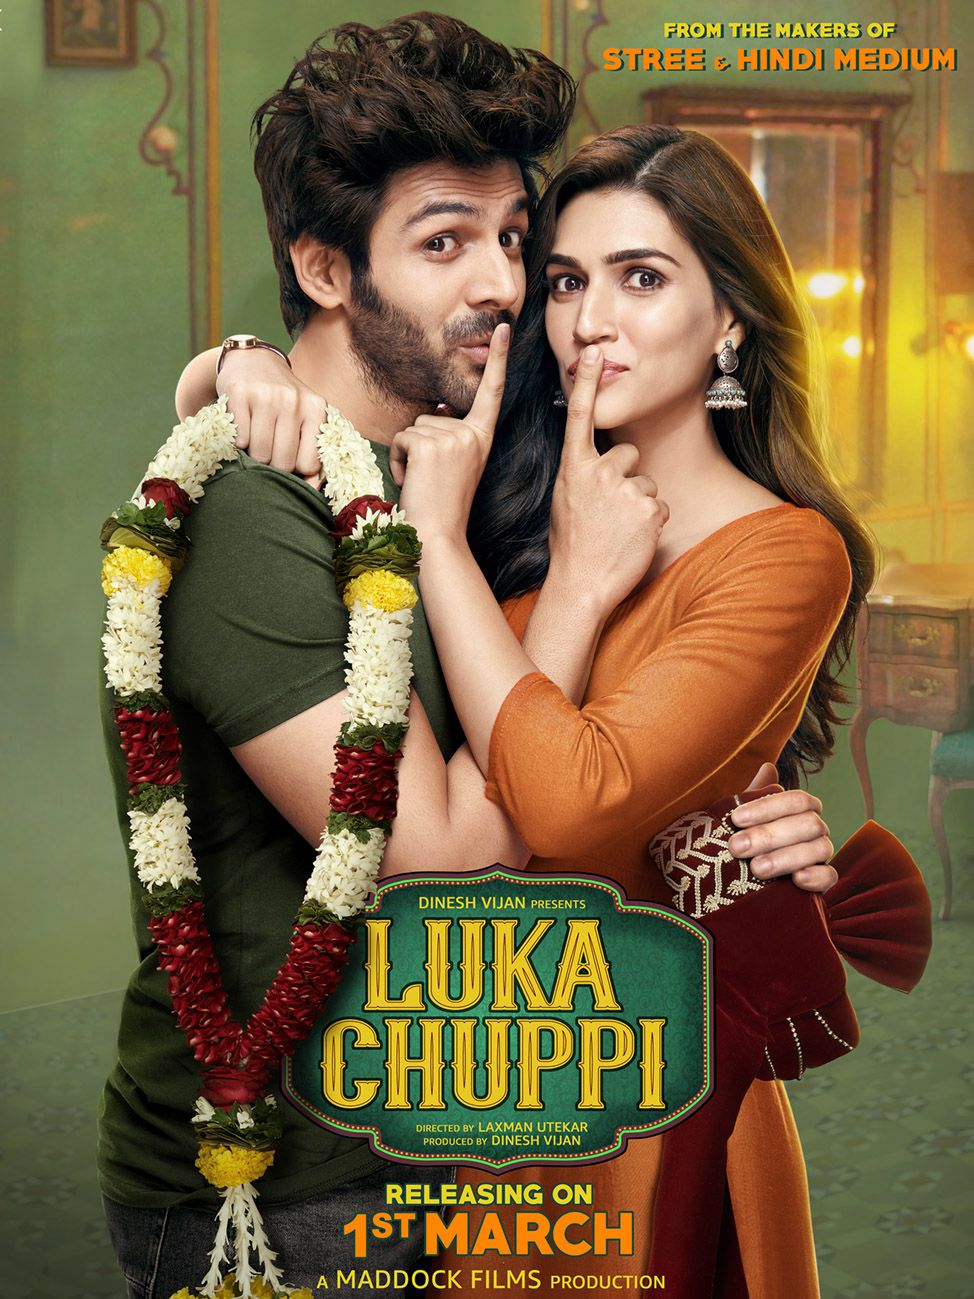 Luka Chuppi - Film (2019)